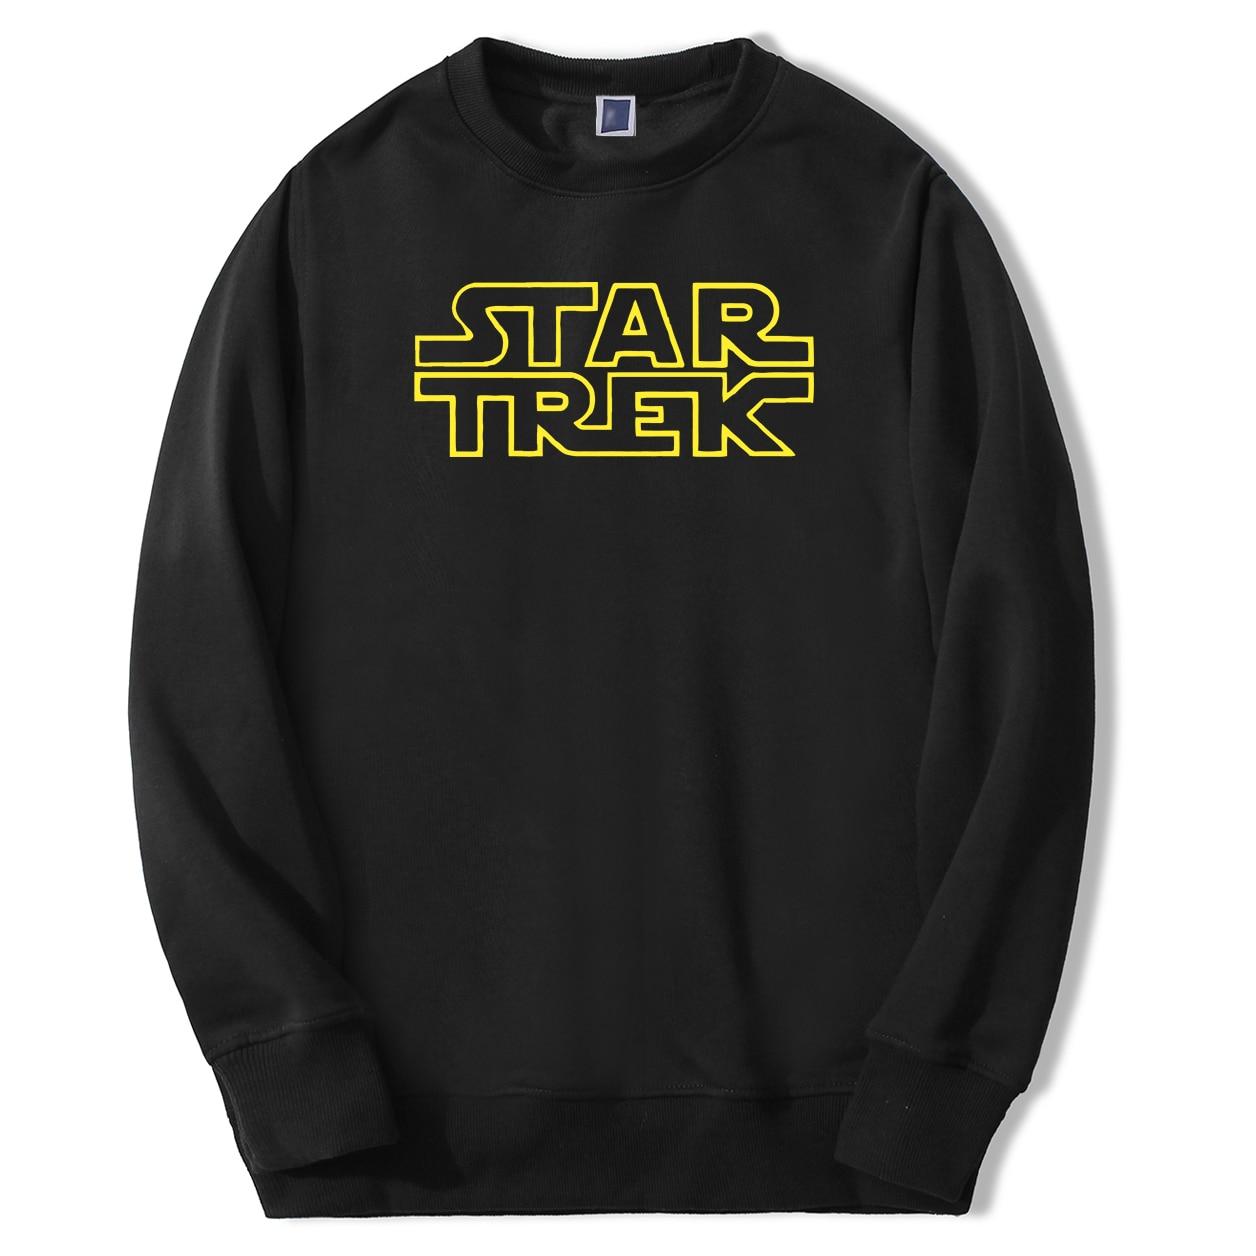 Star trek camisolas masculinas startrek hoodies moletom 2020 primavera outono moda starwars hoodies moletom homem topos